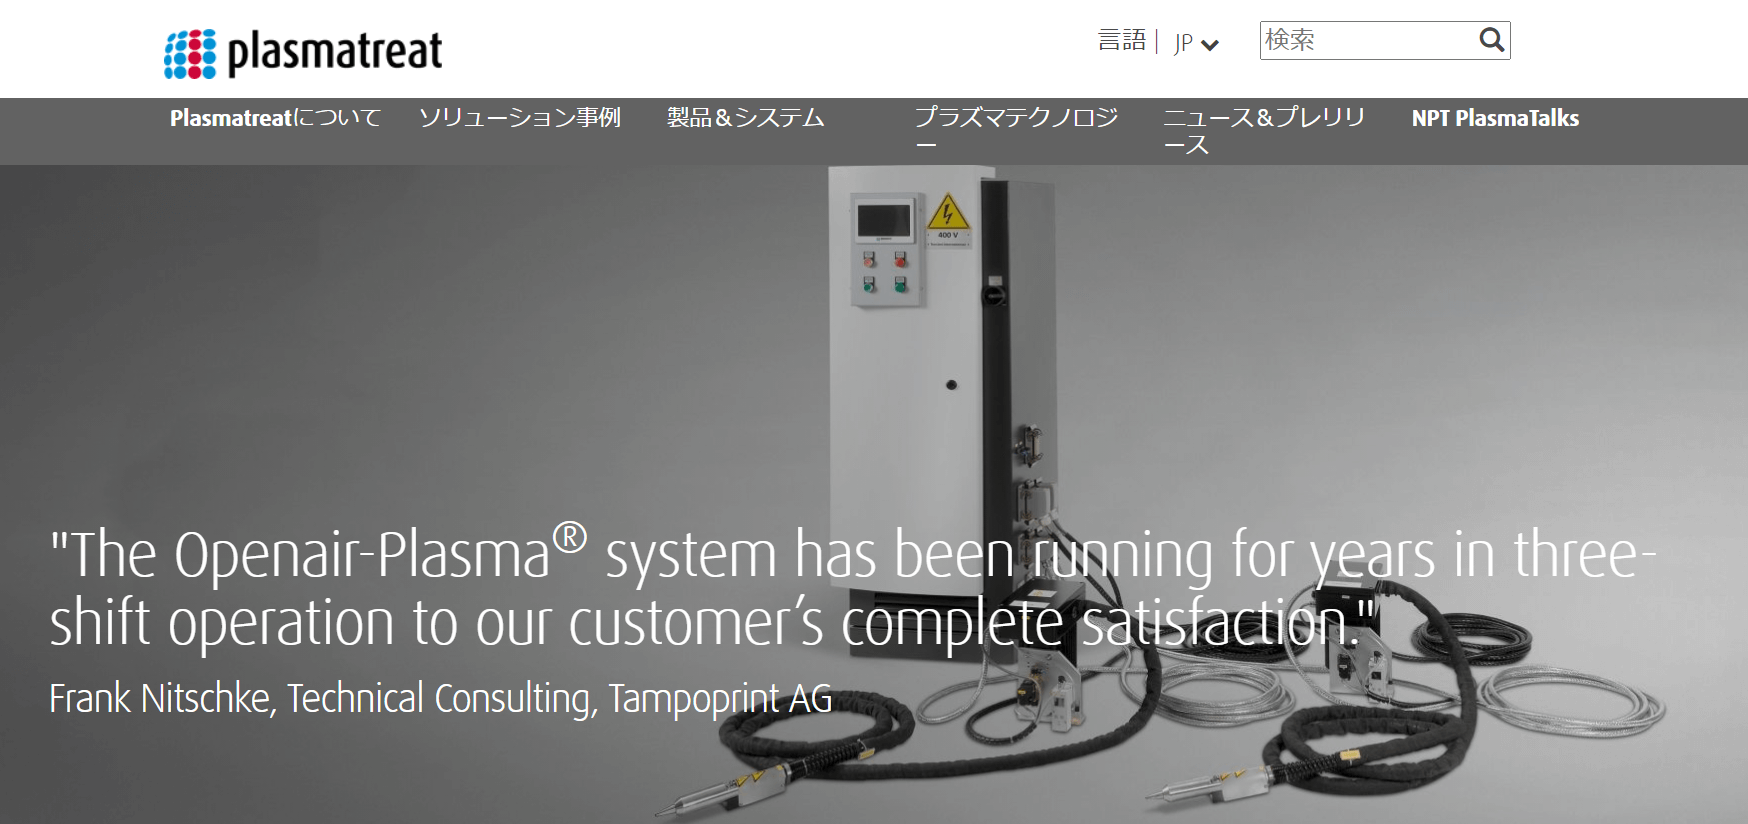 Openair-Plasma(R)システム